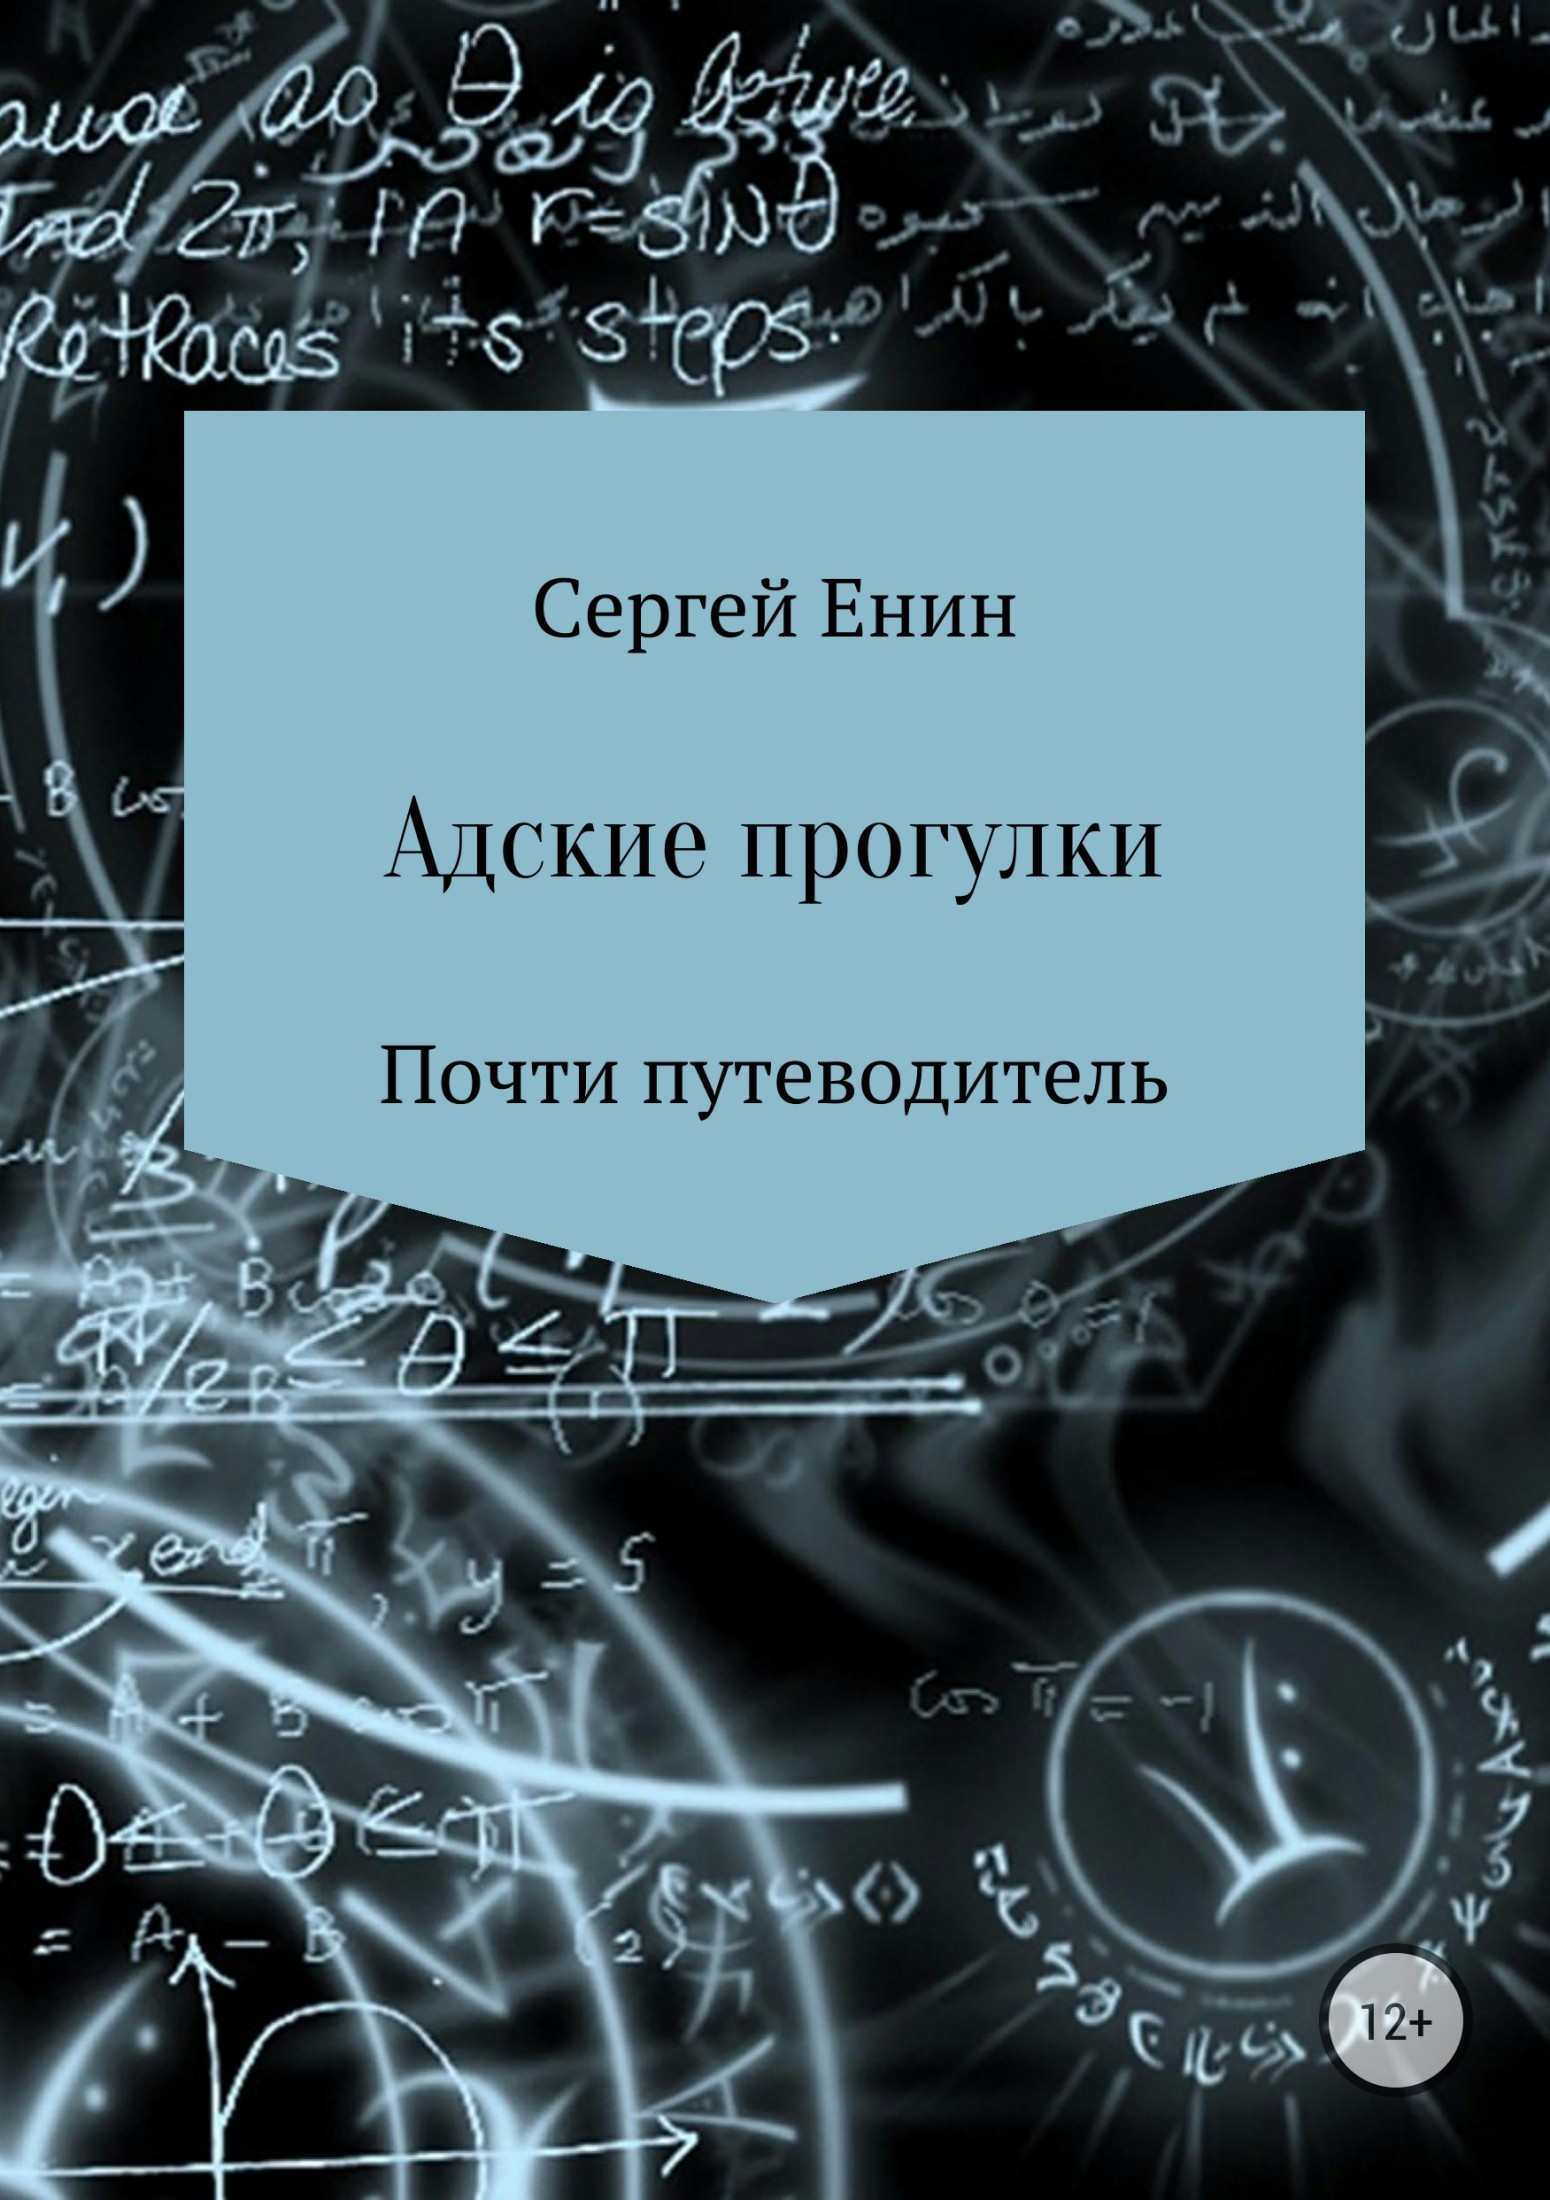 Откроем книгу вместе 39/28/34/39283418.bin.dir/39283418.cover.jpg обложка